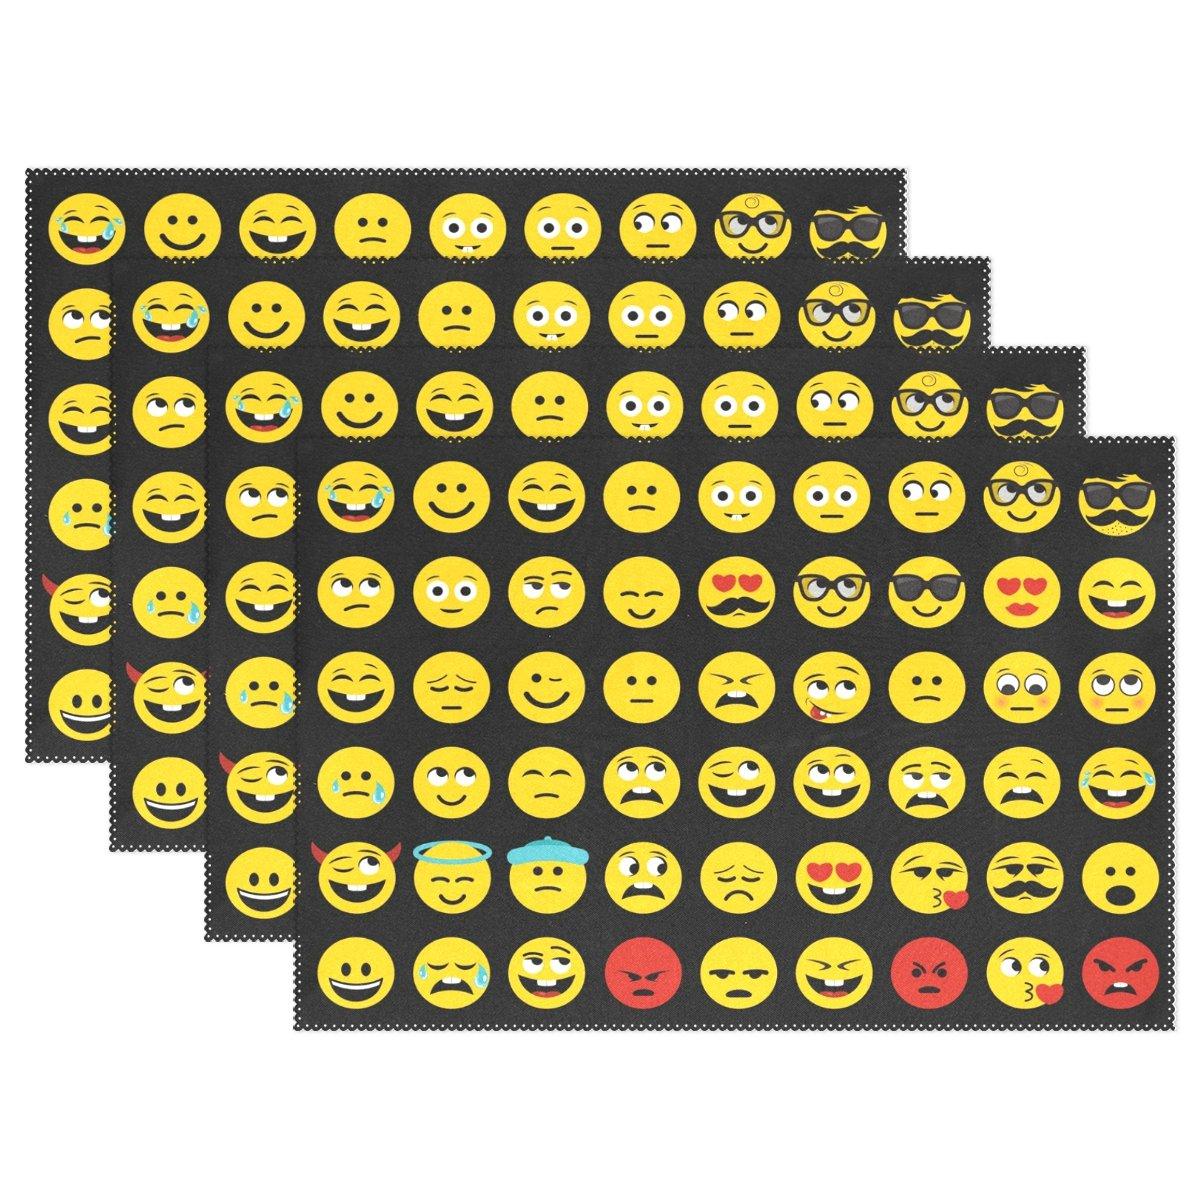 Wozo Funny Emotion絵文字プレースマットテーブルマット12